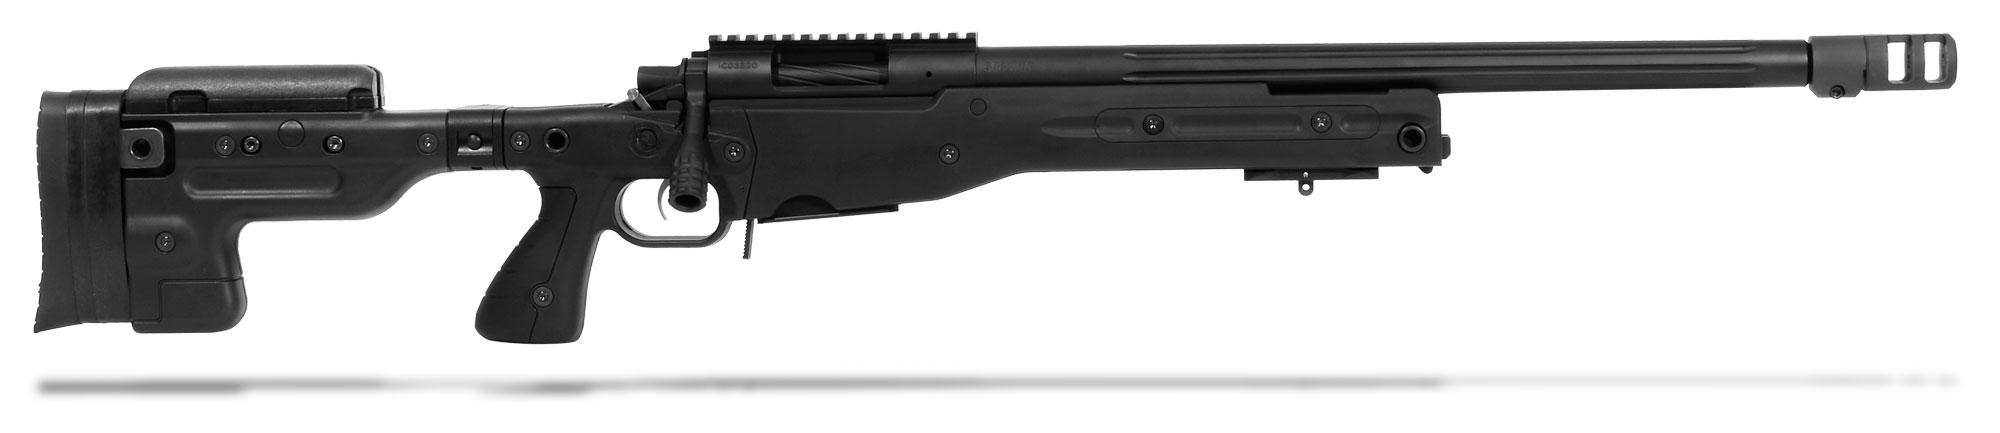 Surgeon Scalpel 308 Winchester Black Rifle